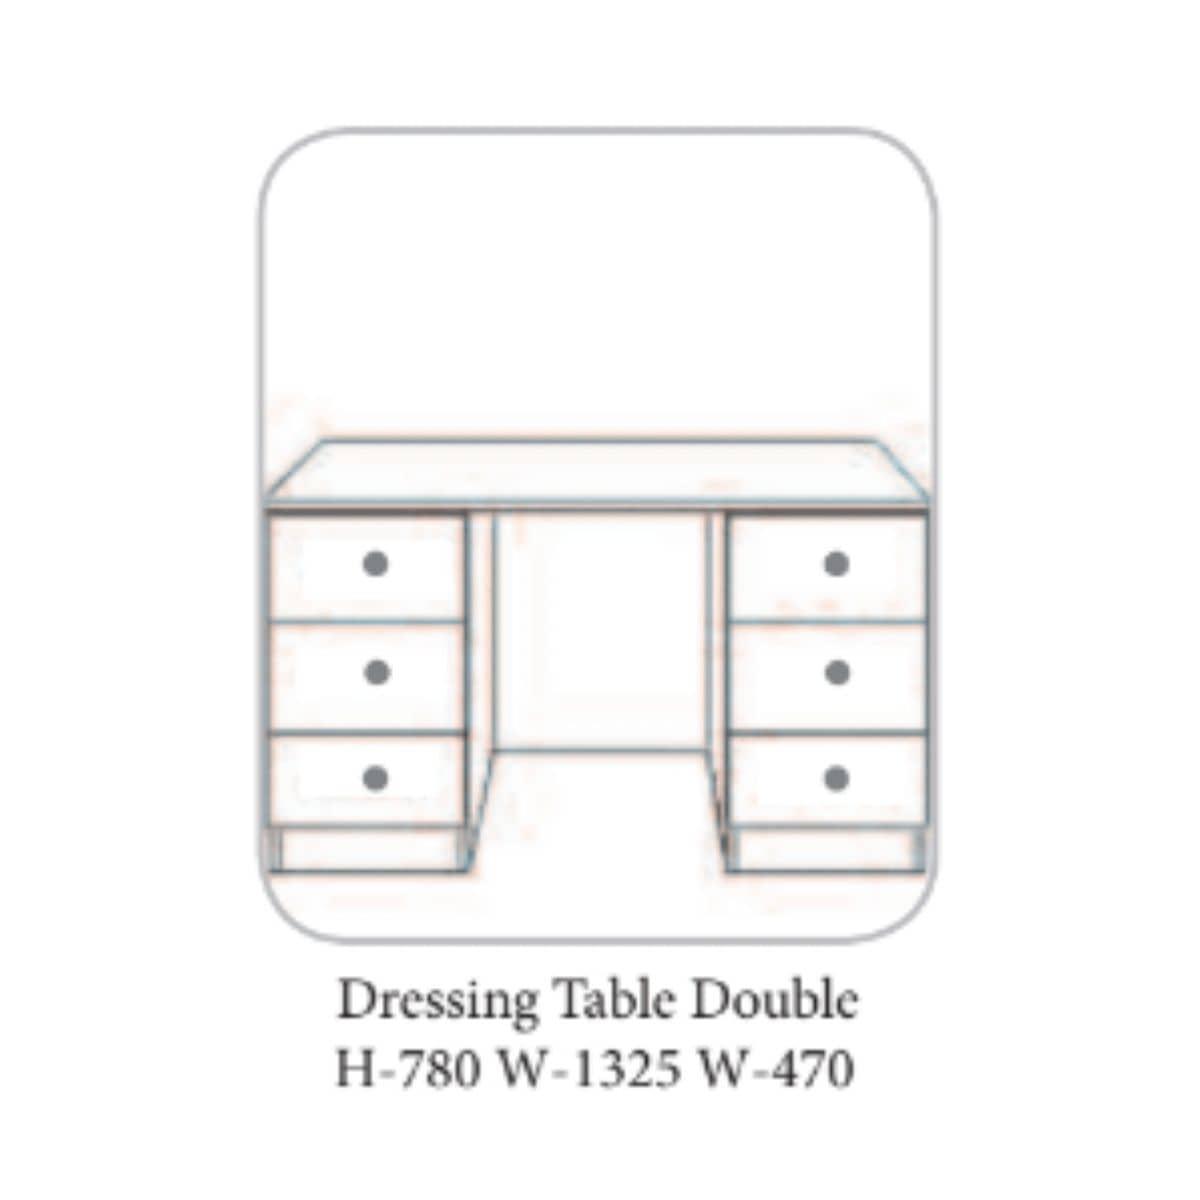 Lee Dressing Table